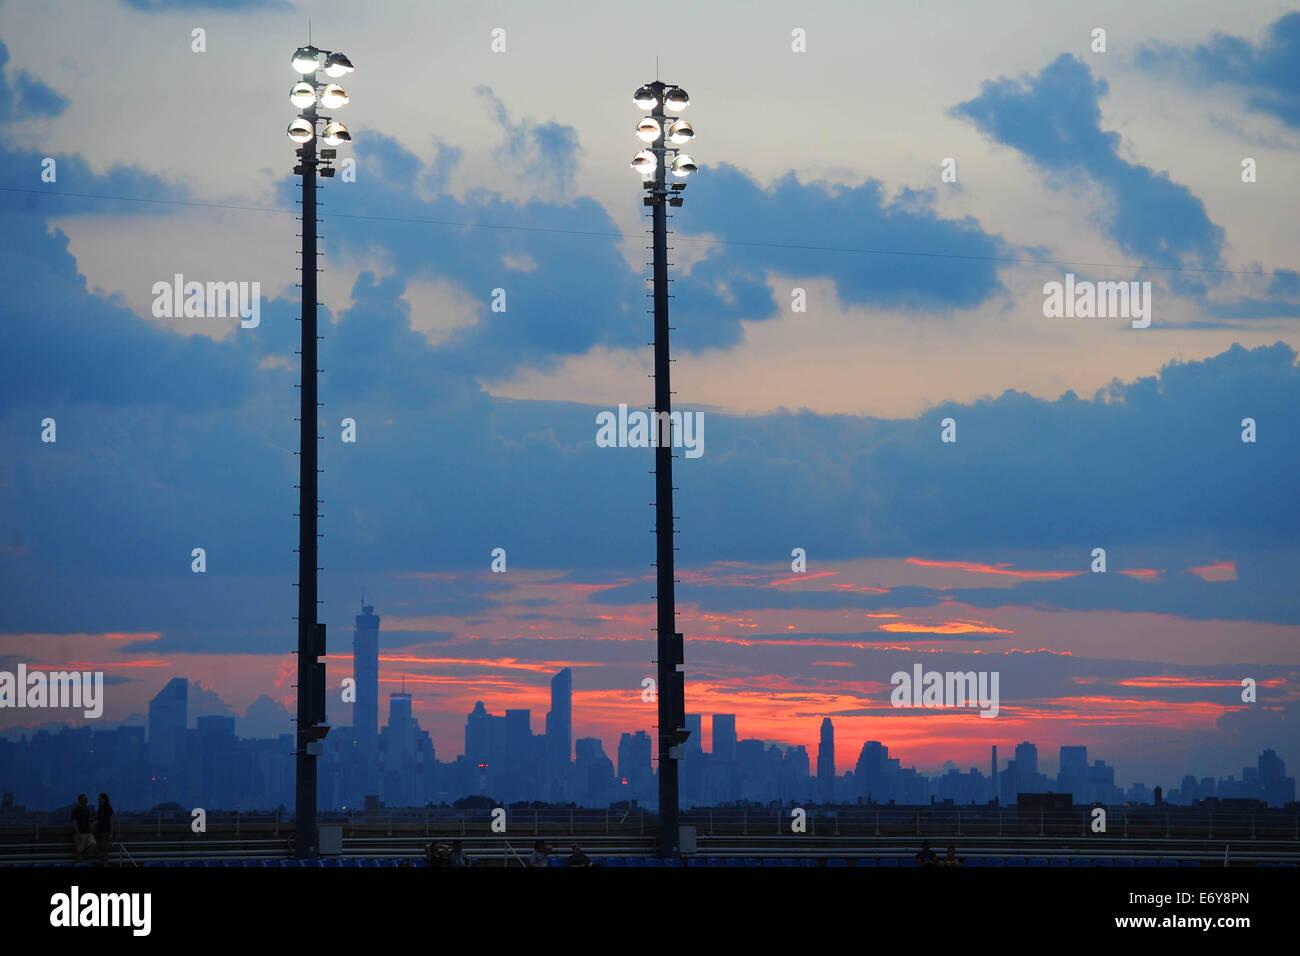 Flushing Meadows, New York, USA. 01st Sep, 2014. US Open tennis championships. The sun sets over Arthur Ashe stadium - Stock Image